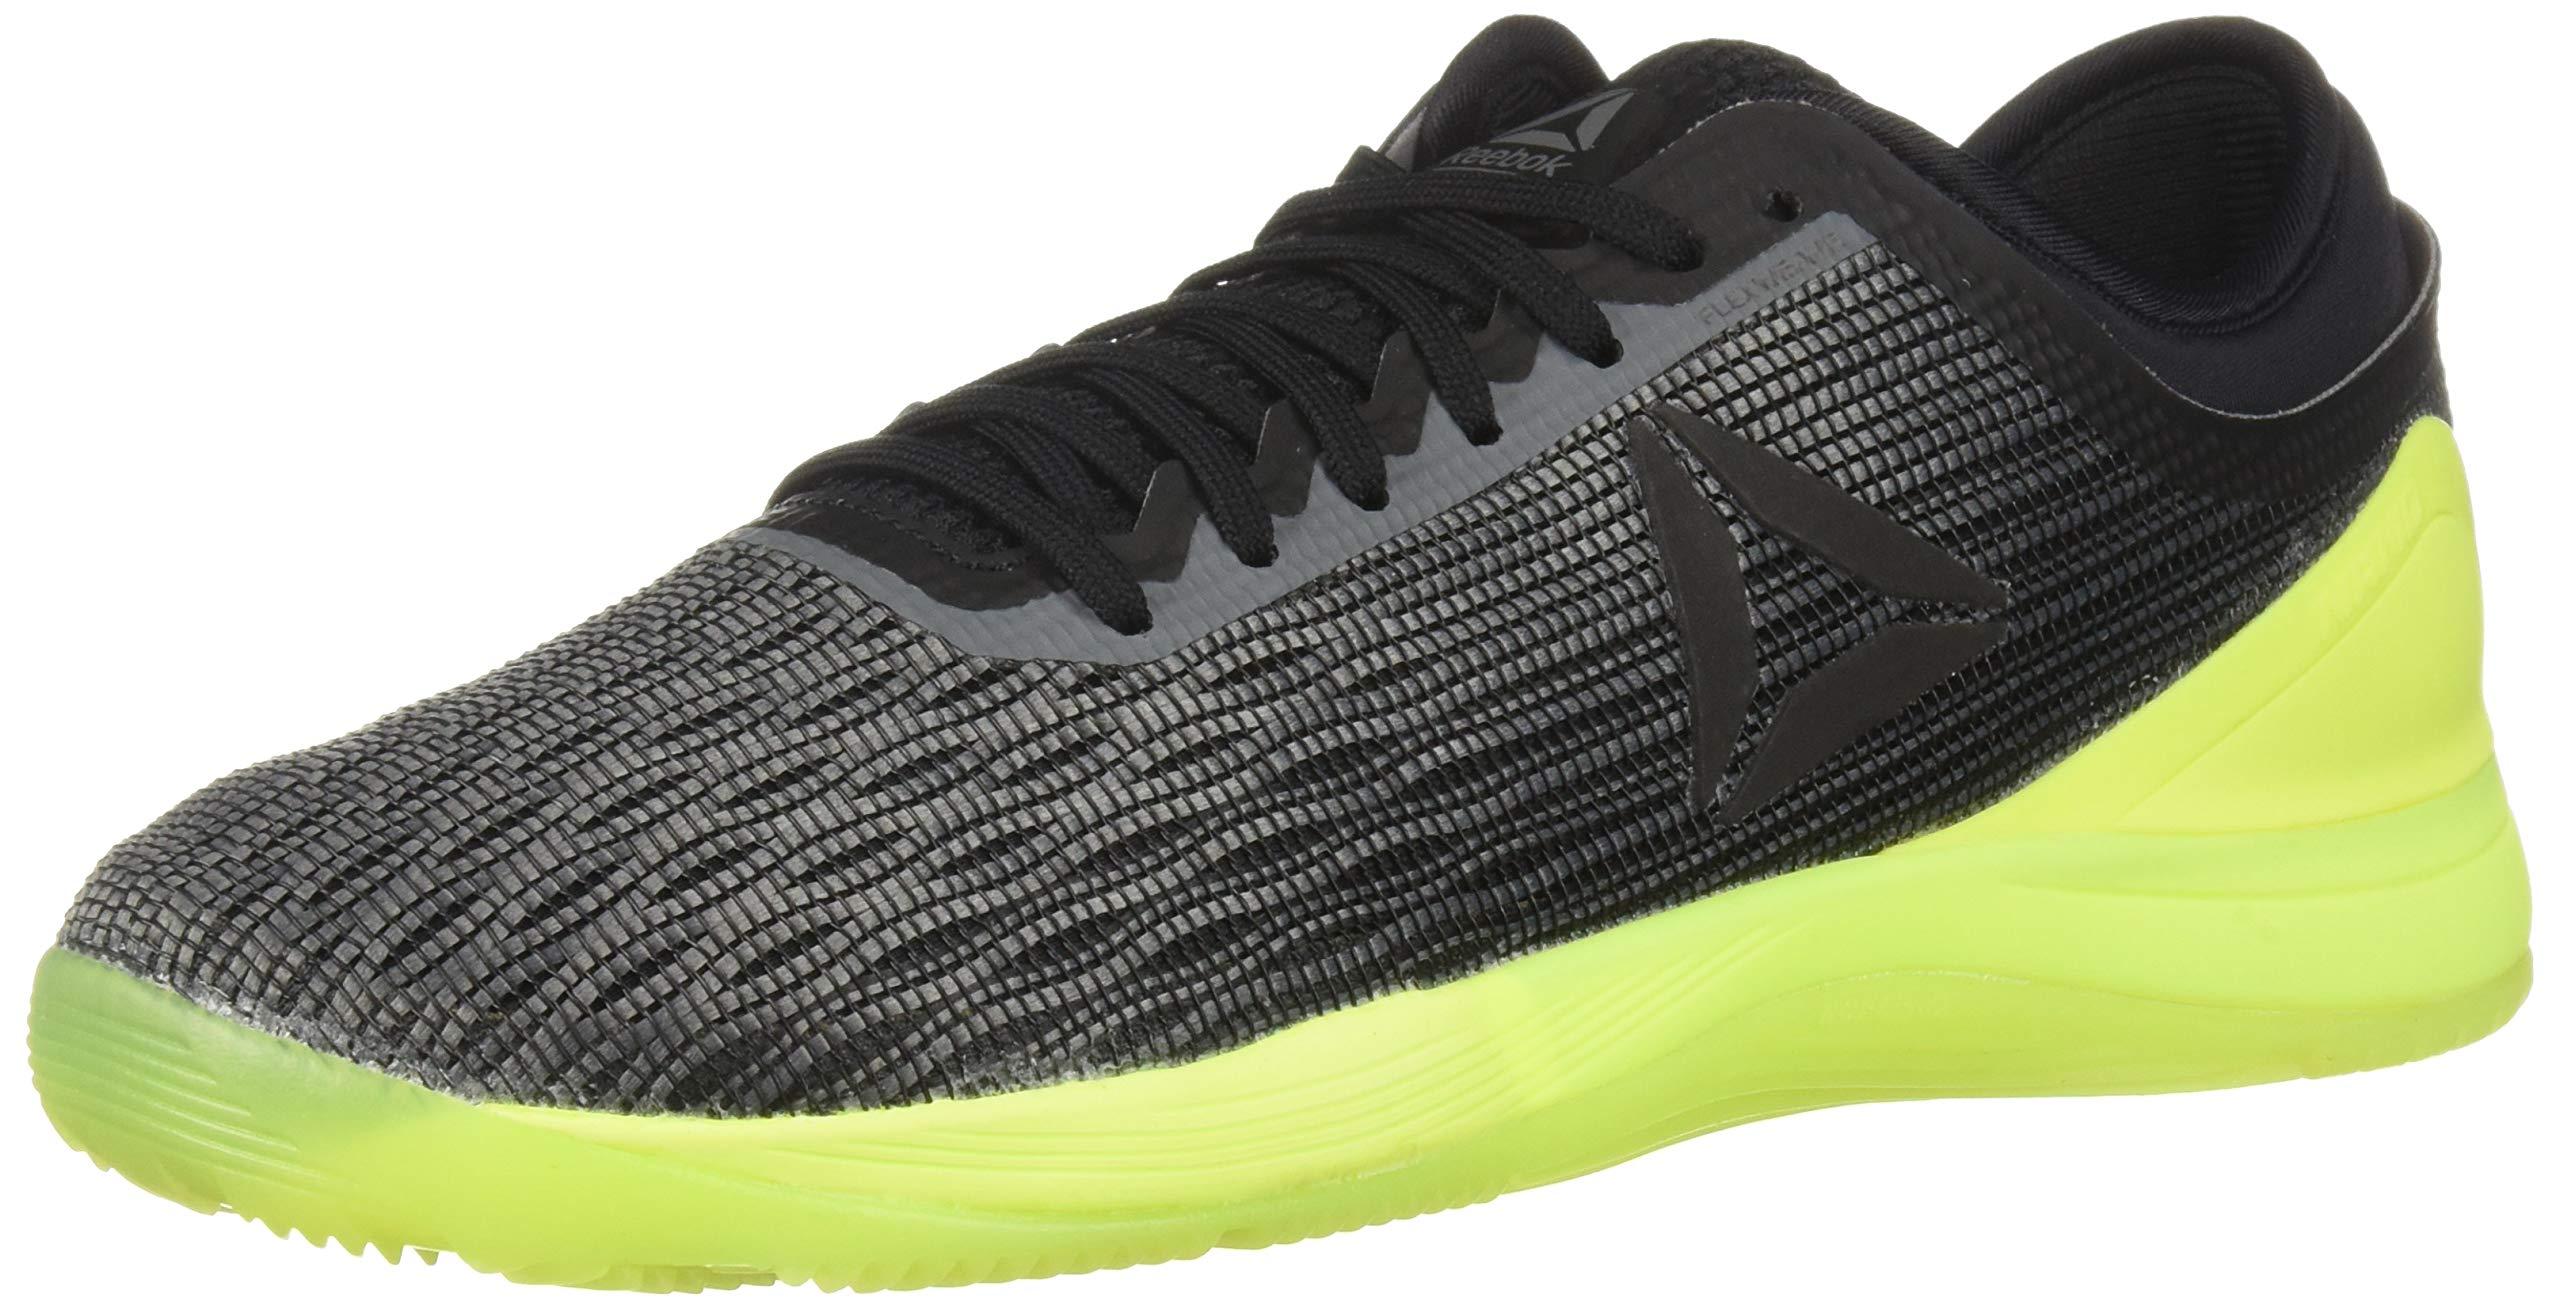 Reebok Men's CROSSFIT Nano 8.0 Sneaker, Alloy/Black/Solar Yellow, 6.5 M US by Reebok (Image #1)